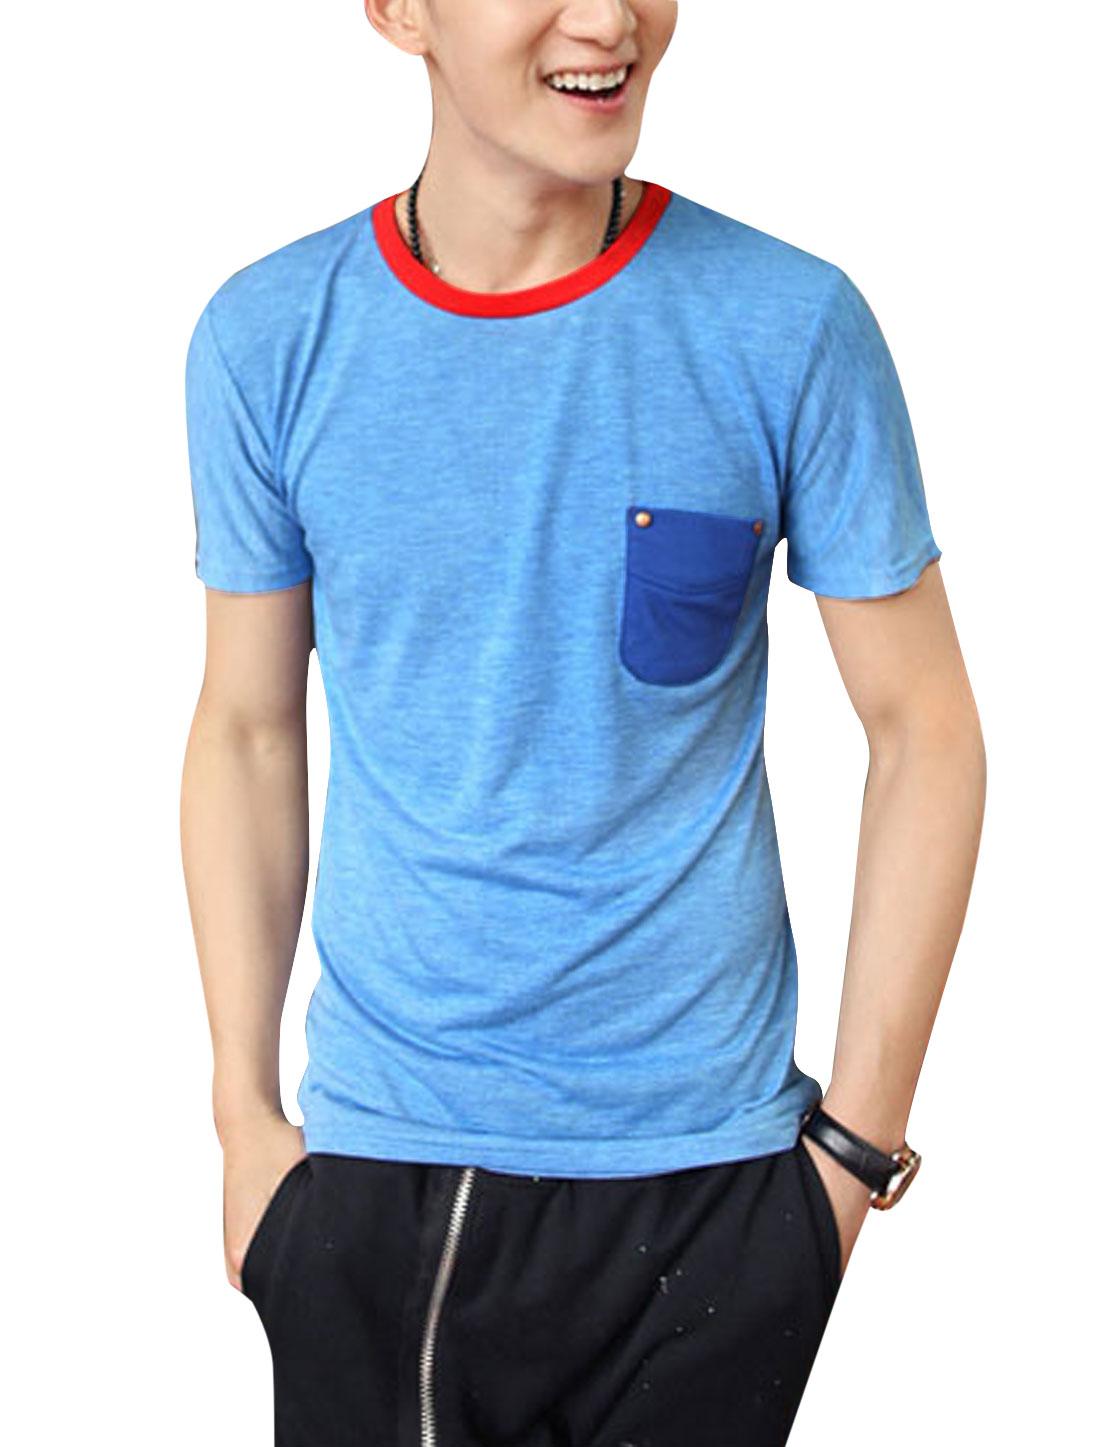 Men Short Sleeve Single Chest Pocket Tee Top Light Blue S